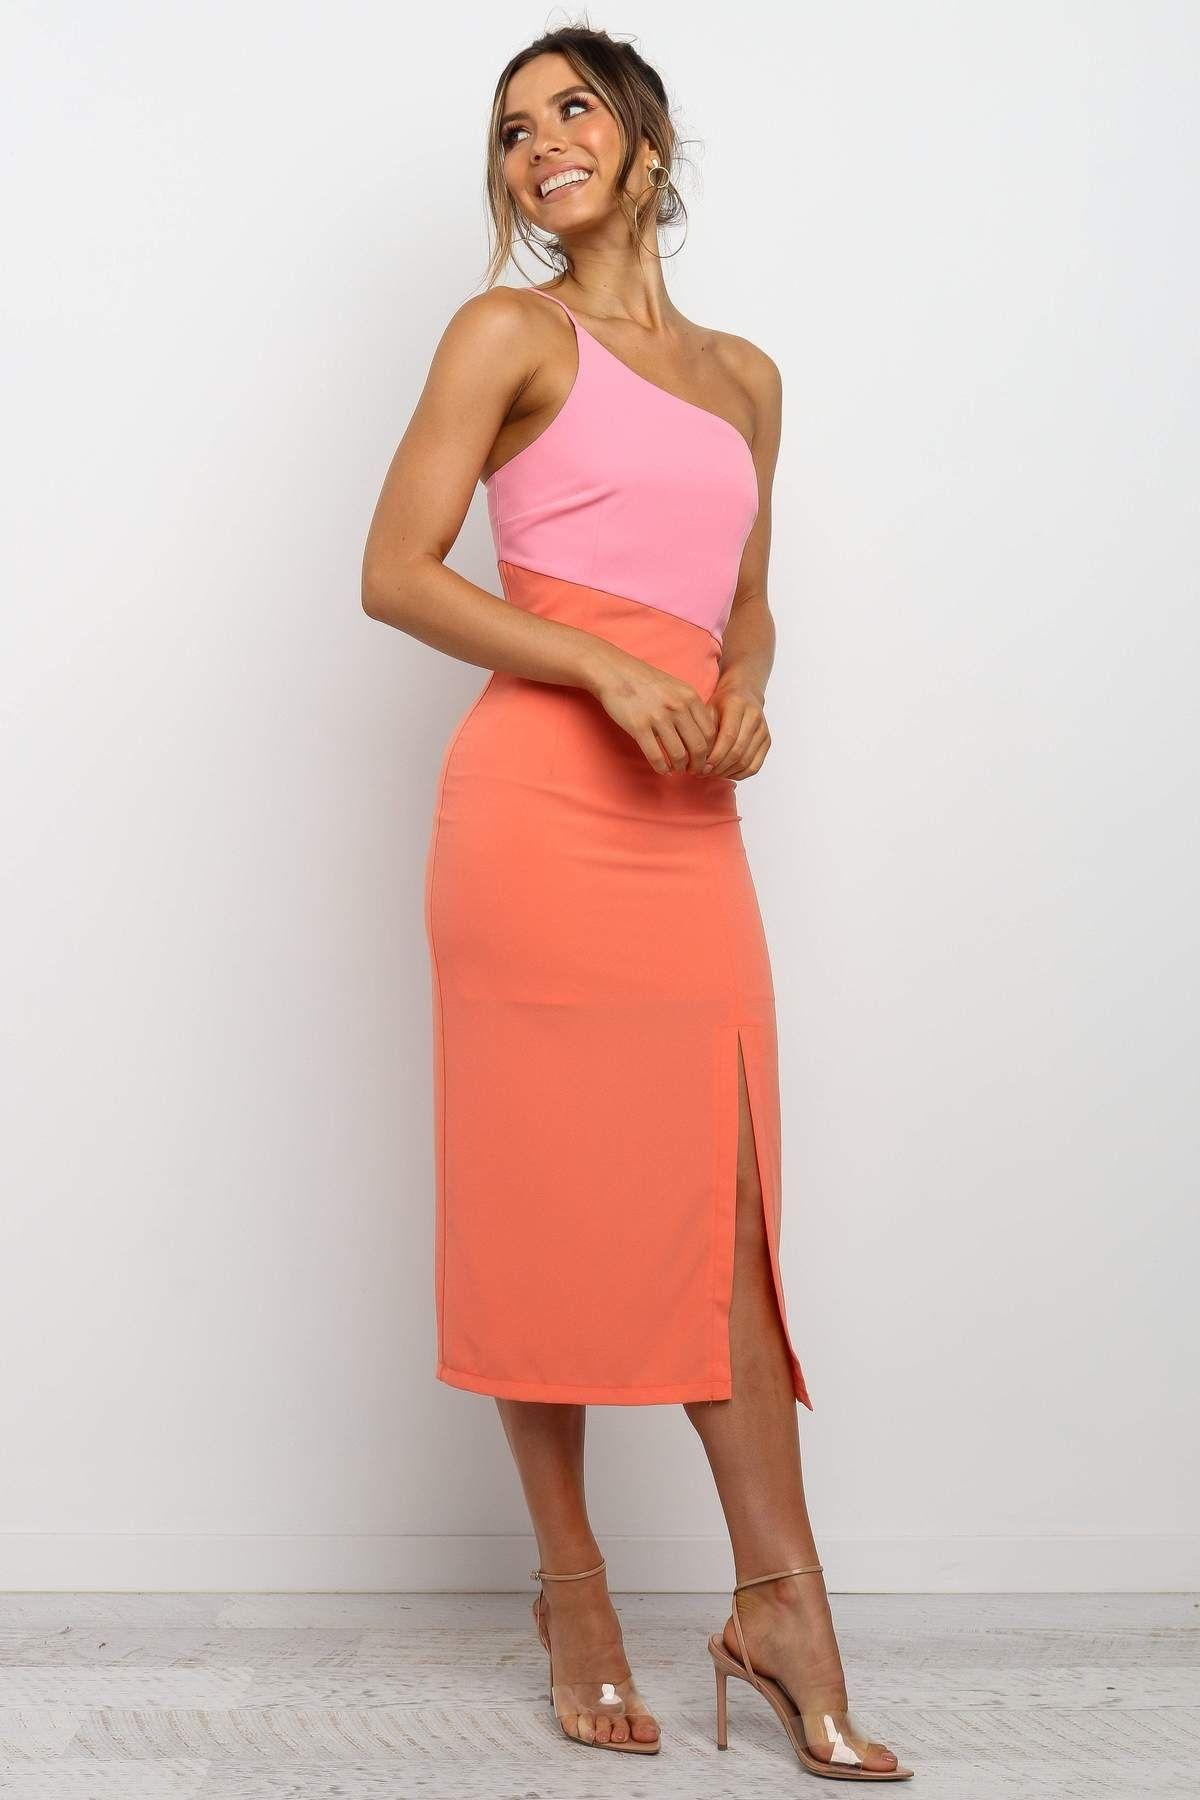 xiomar dress orange in 2020 dinner outfit classy